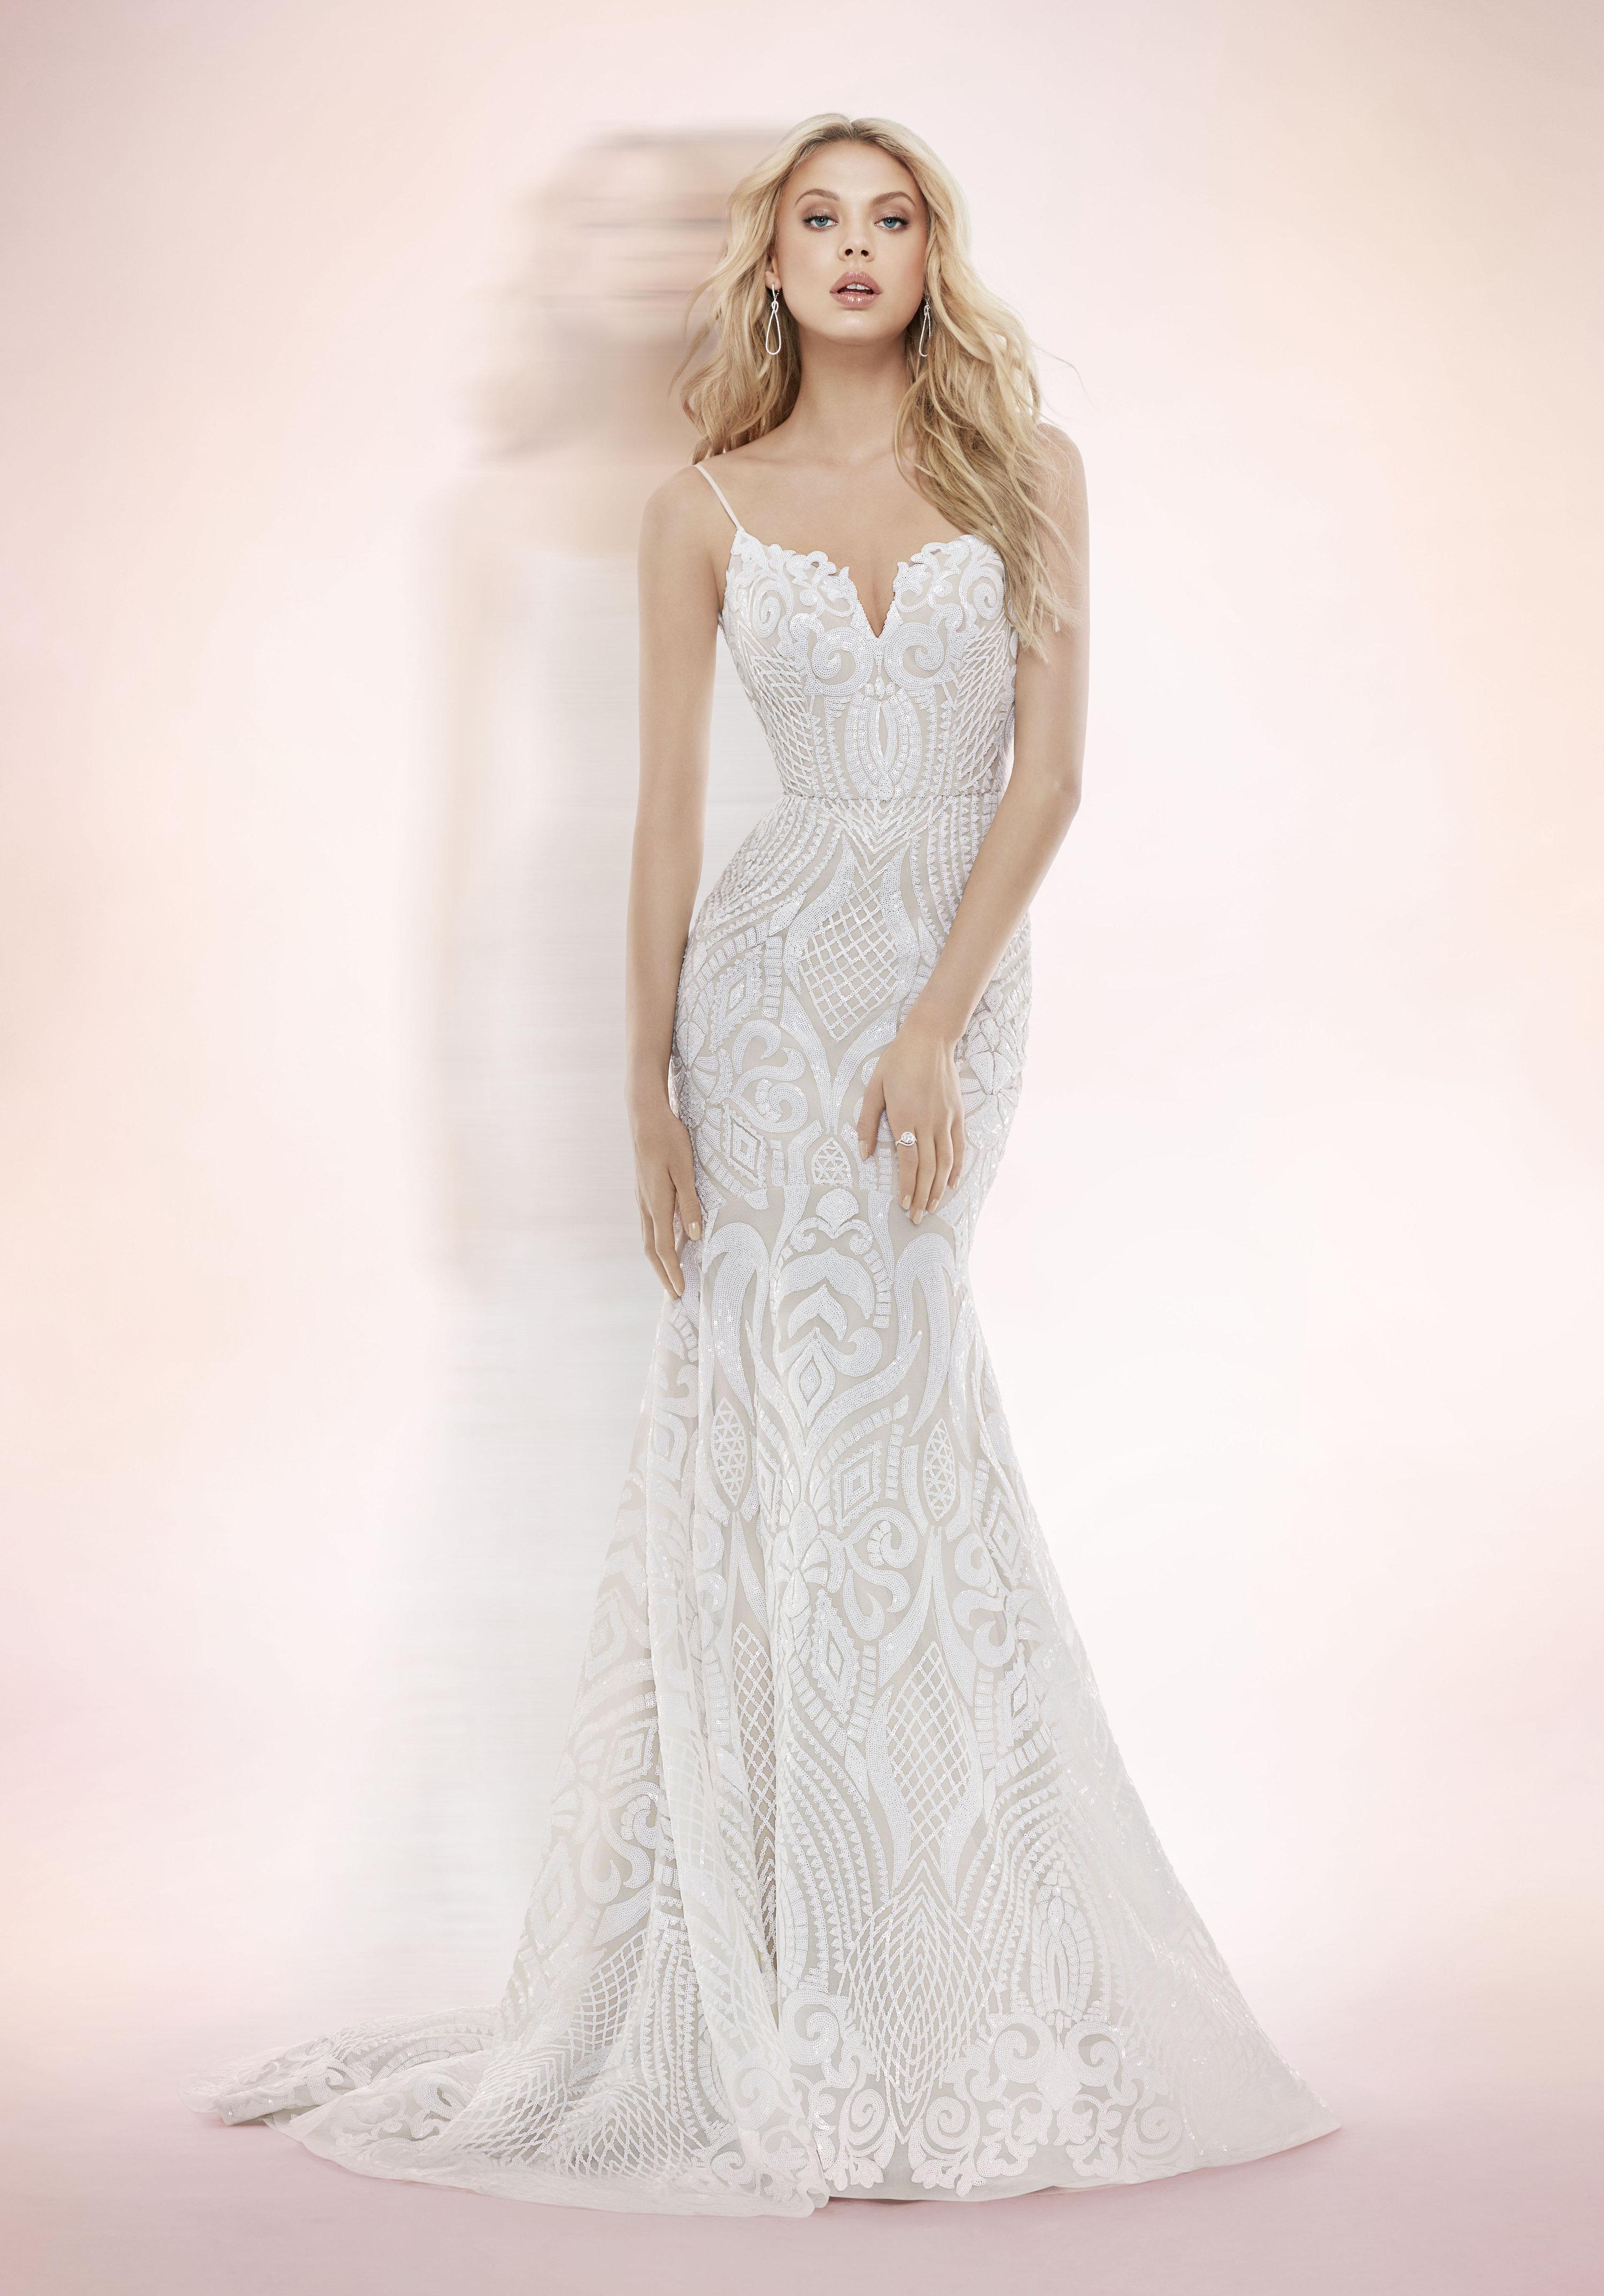 Modern Fit And Flare Wedding Dress Kleinfeld Bridal